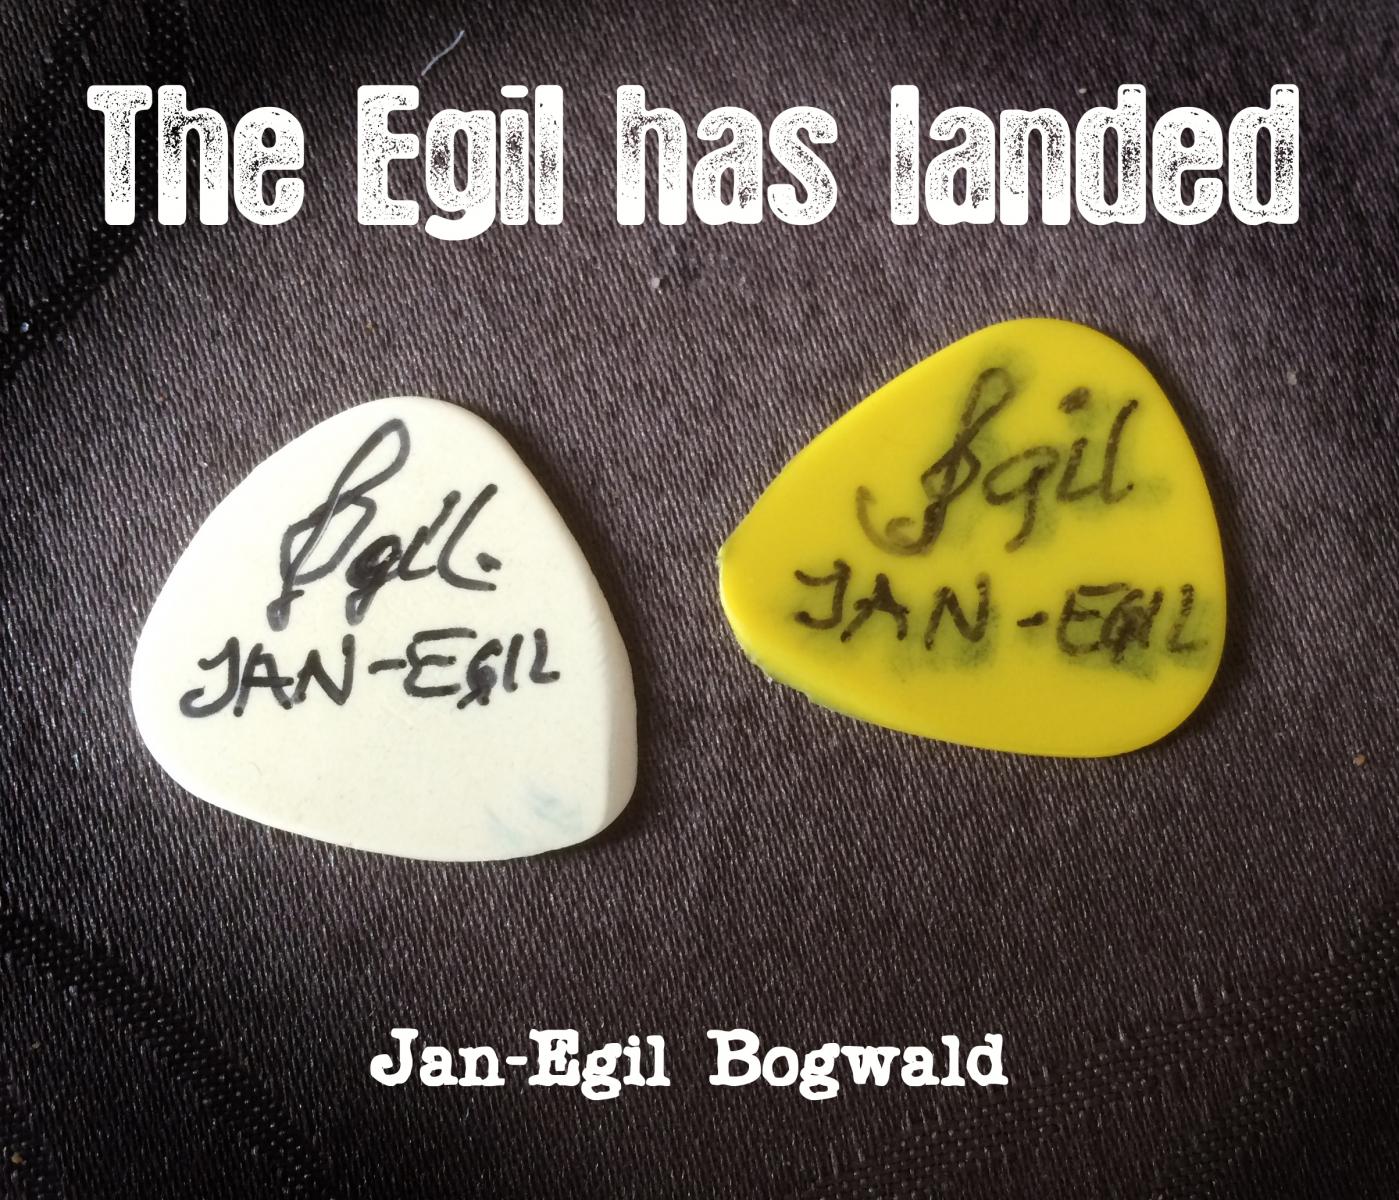 Jan-Egil Bogwald